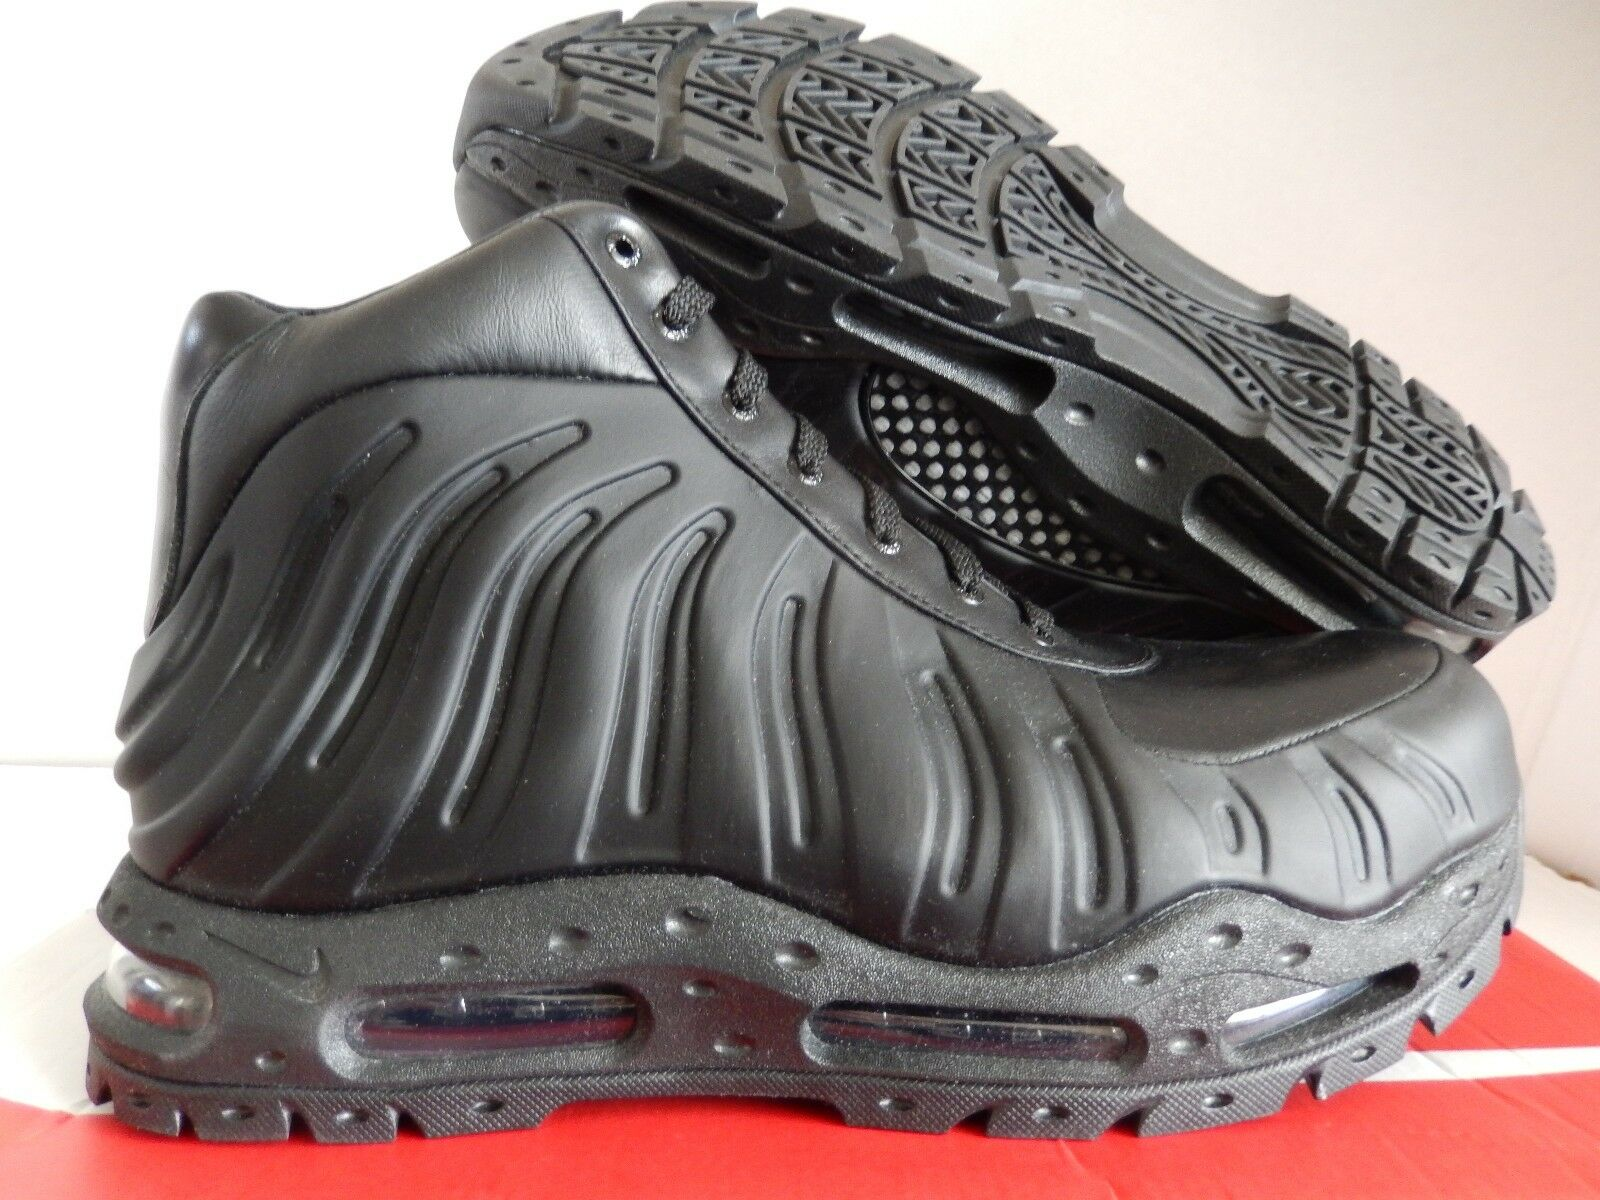 NIKE AIR MAX FOAMDOME FOAMPOSITE BOOTS BLACK-BLACK SZ 9.5 [843749-002]